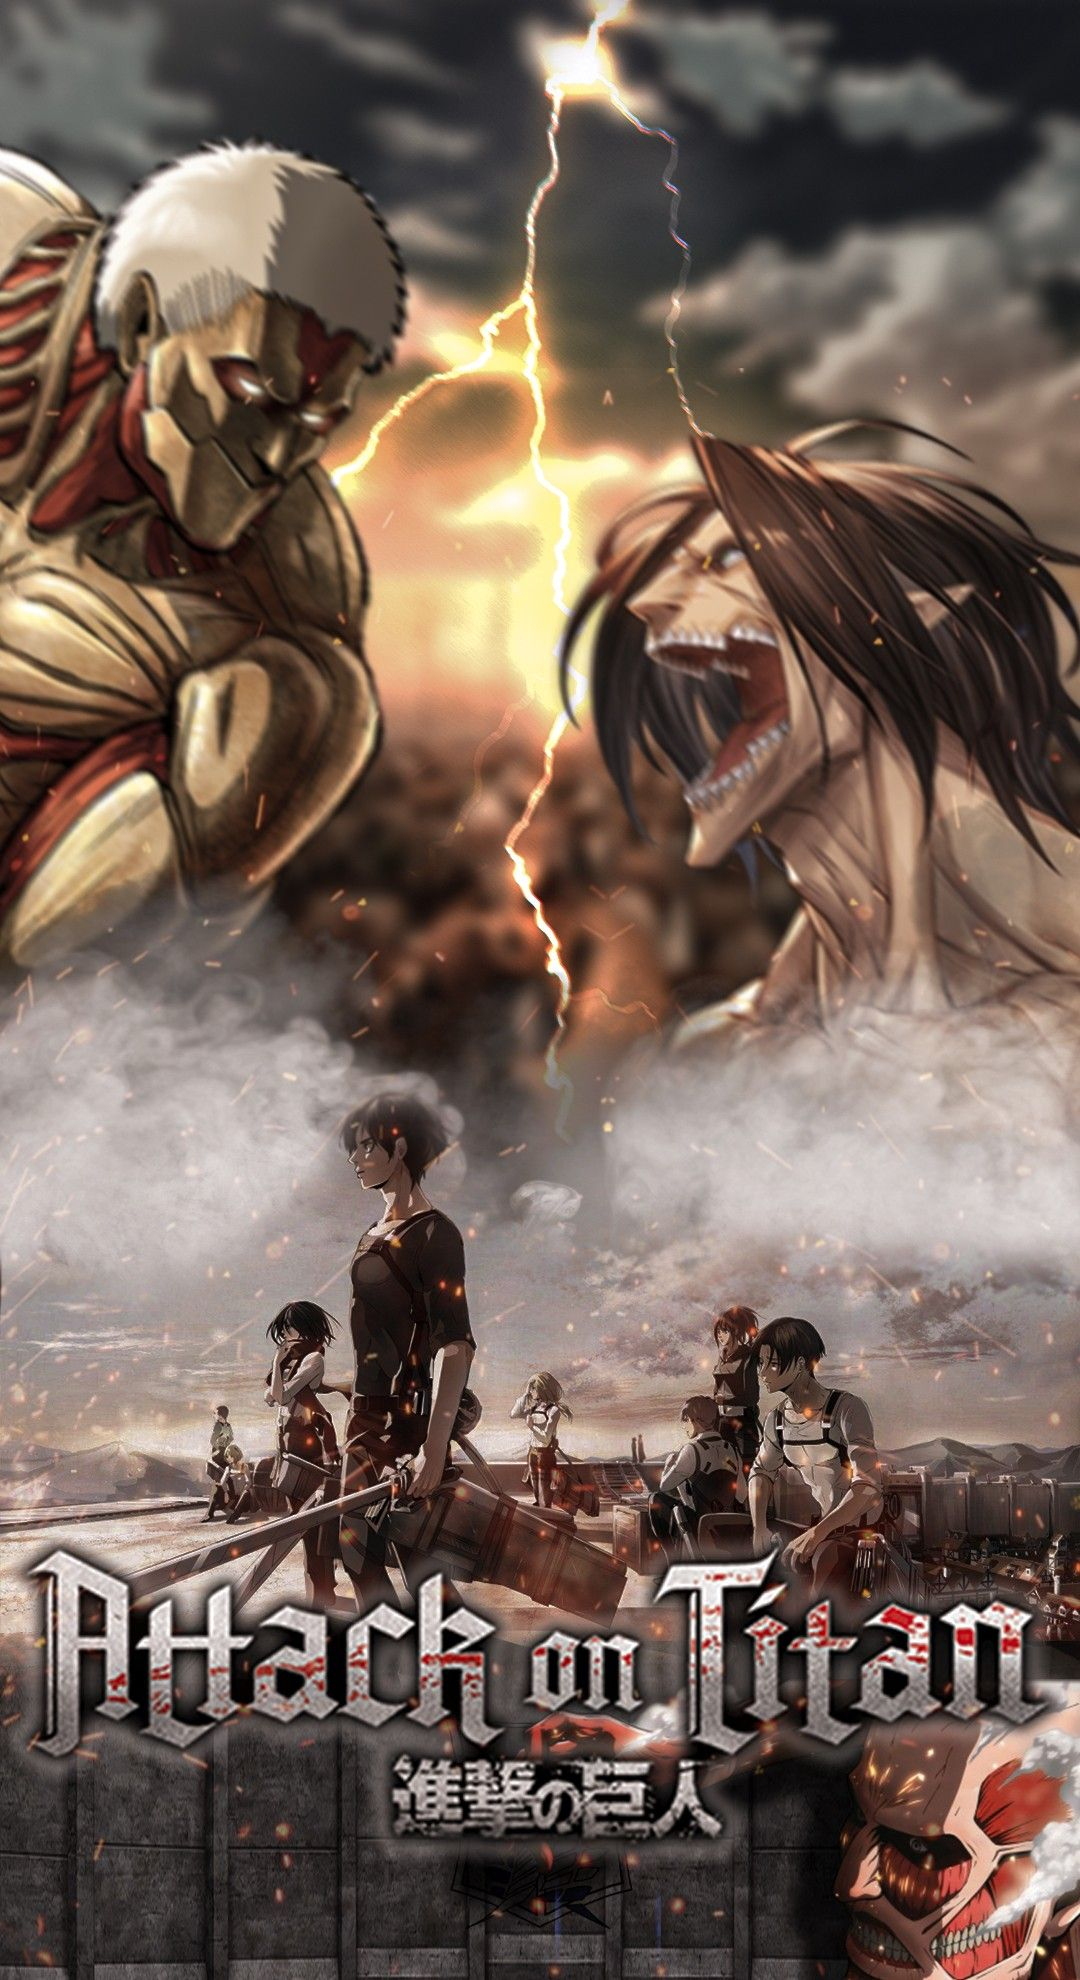 Aot Pt 2 Attack On Titan Anime Attack On Titan Fanart Attack On Titan Levi